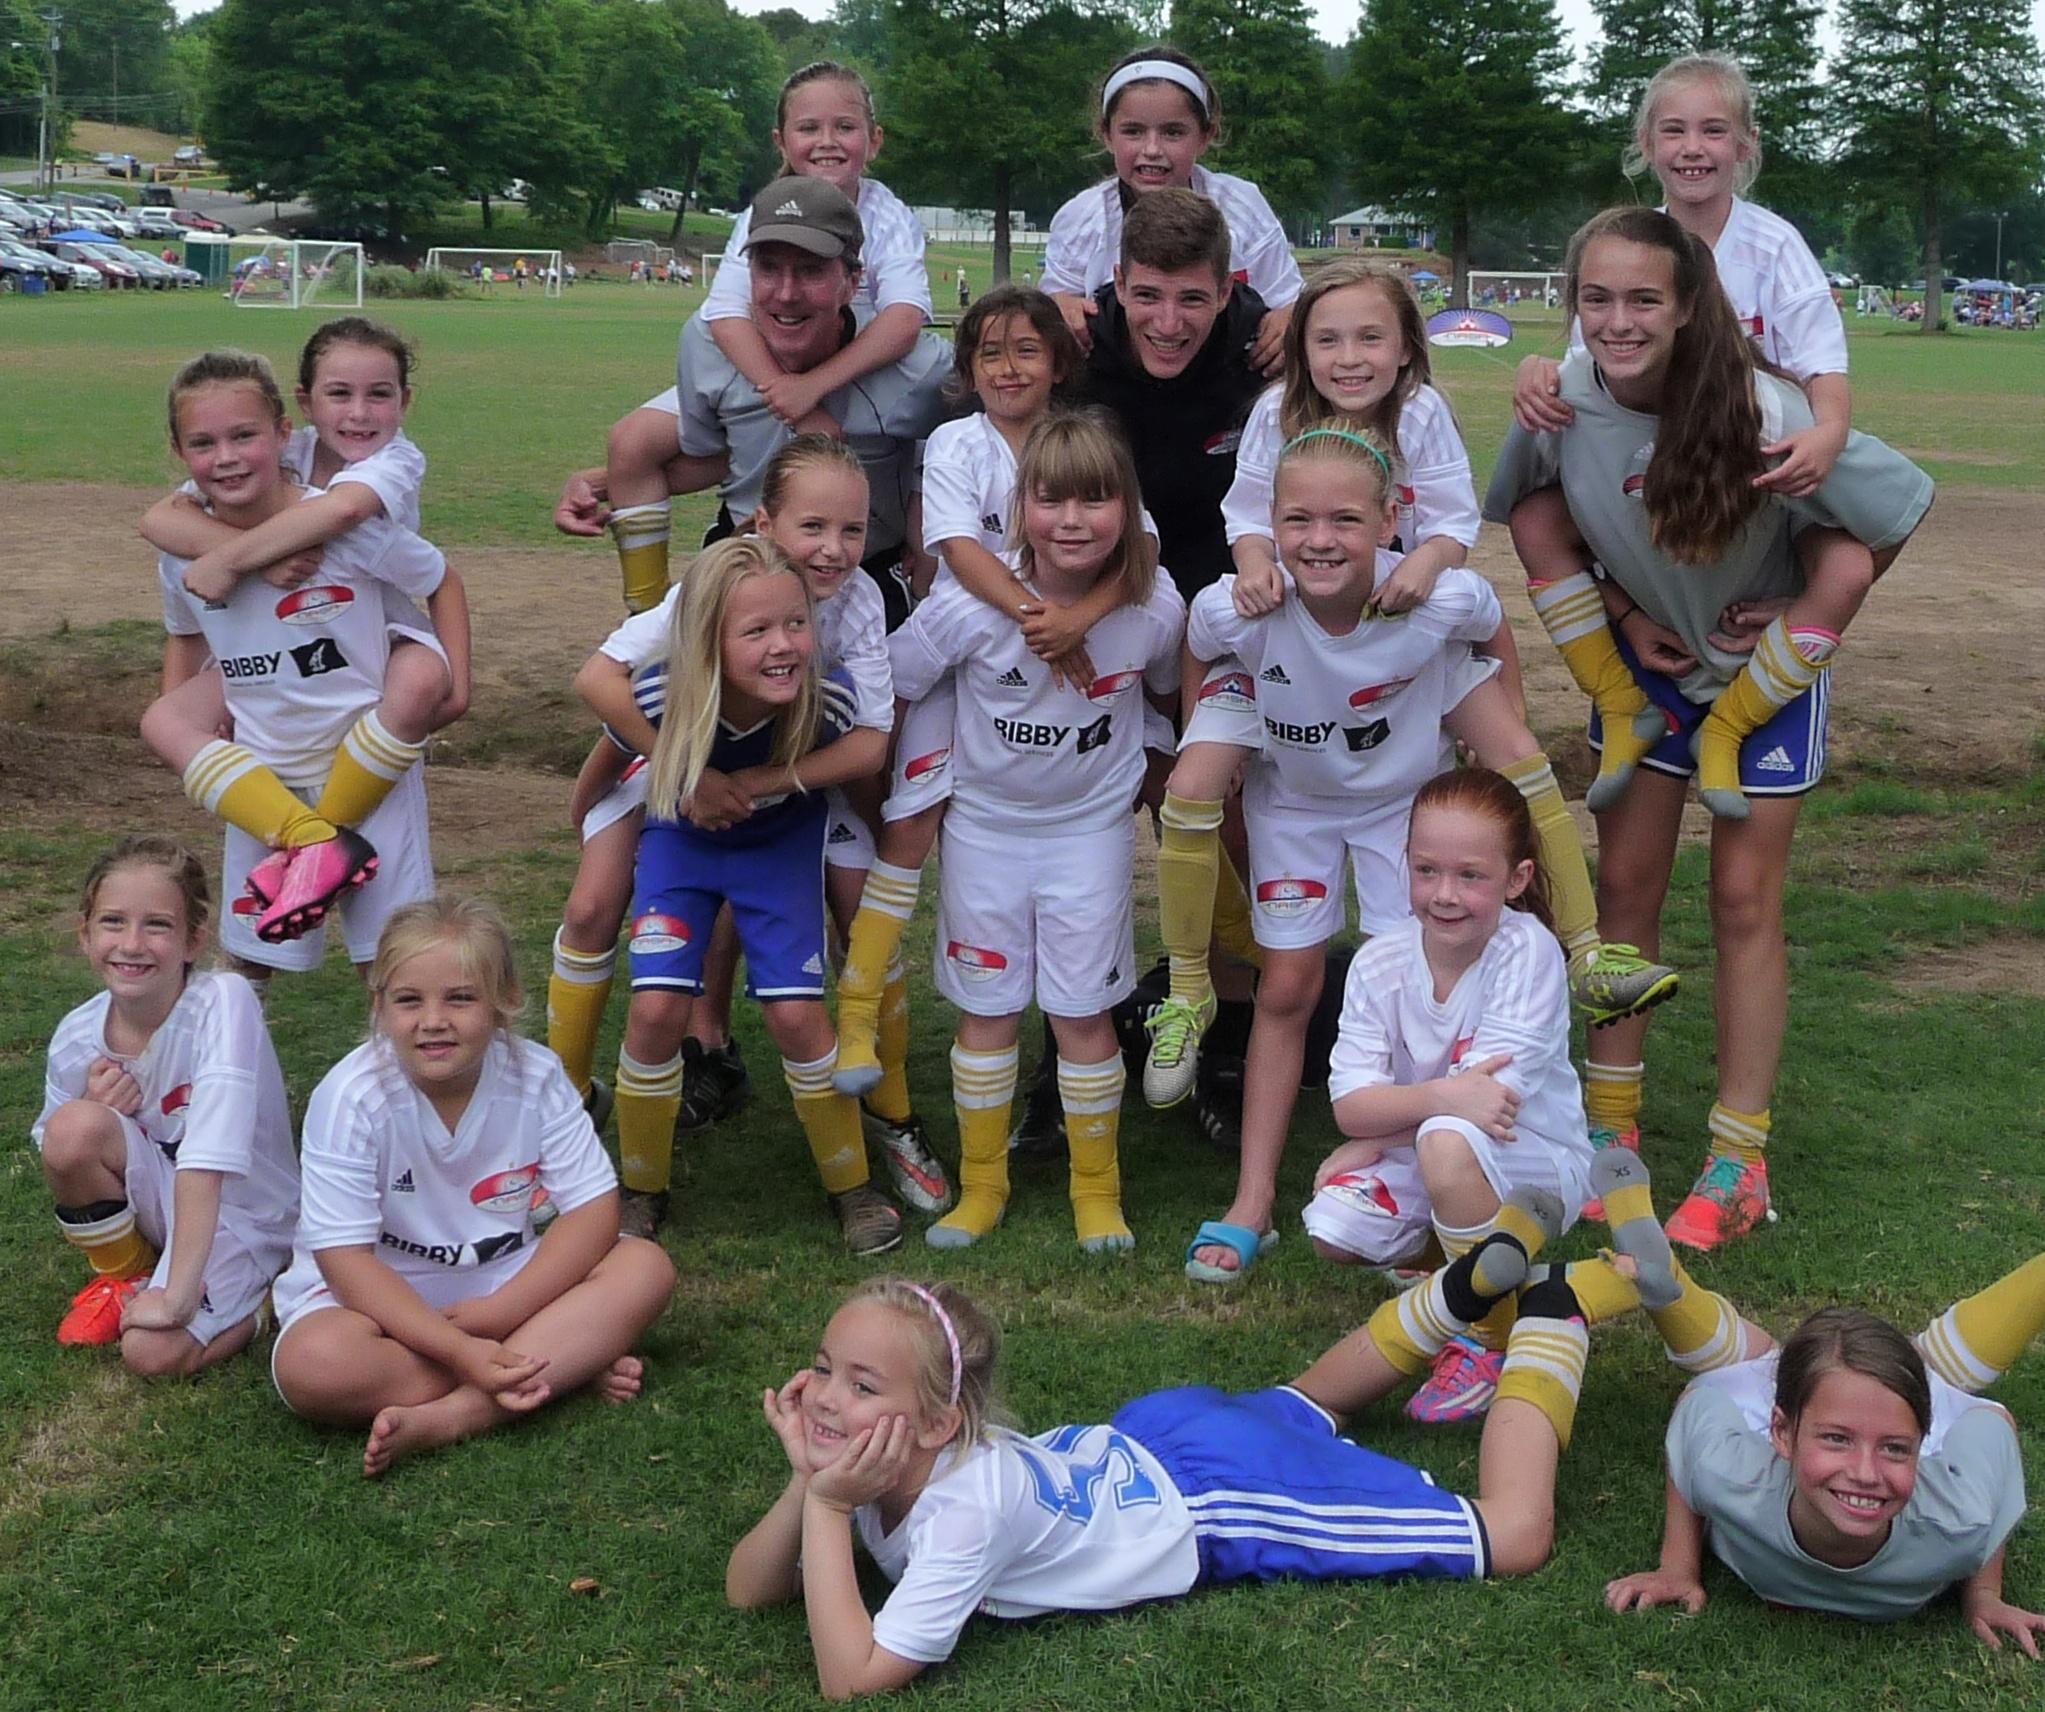 nasa soccer girls - photo #13